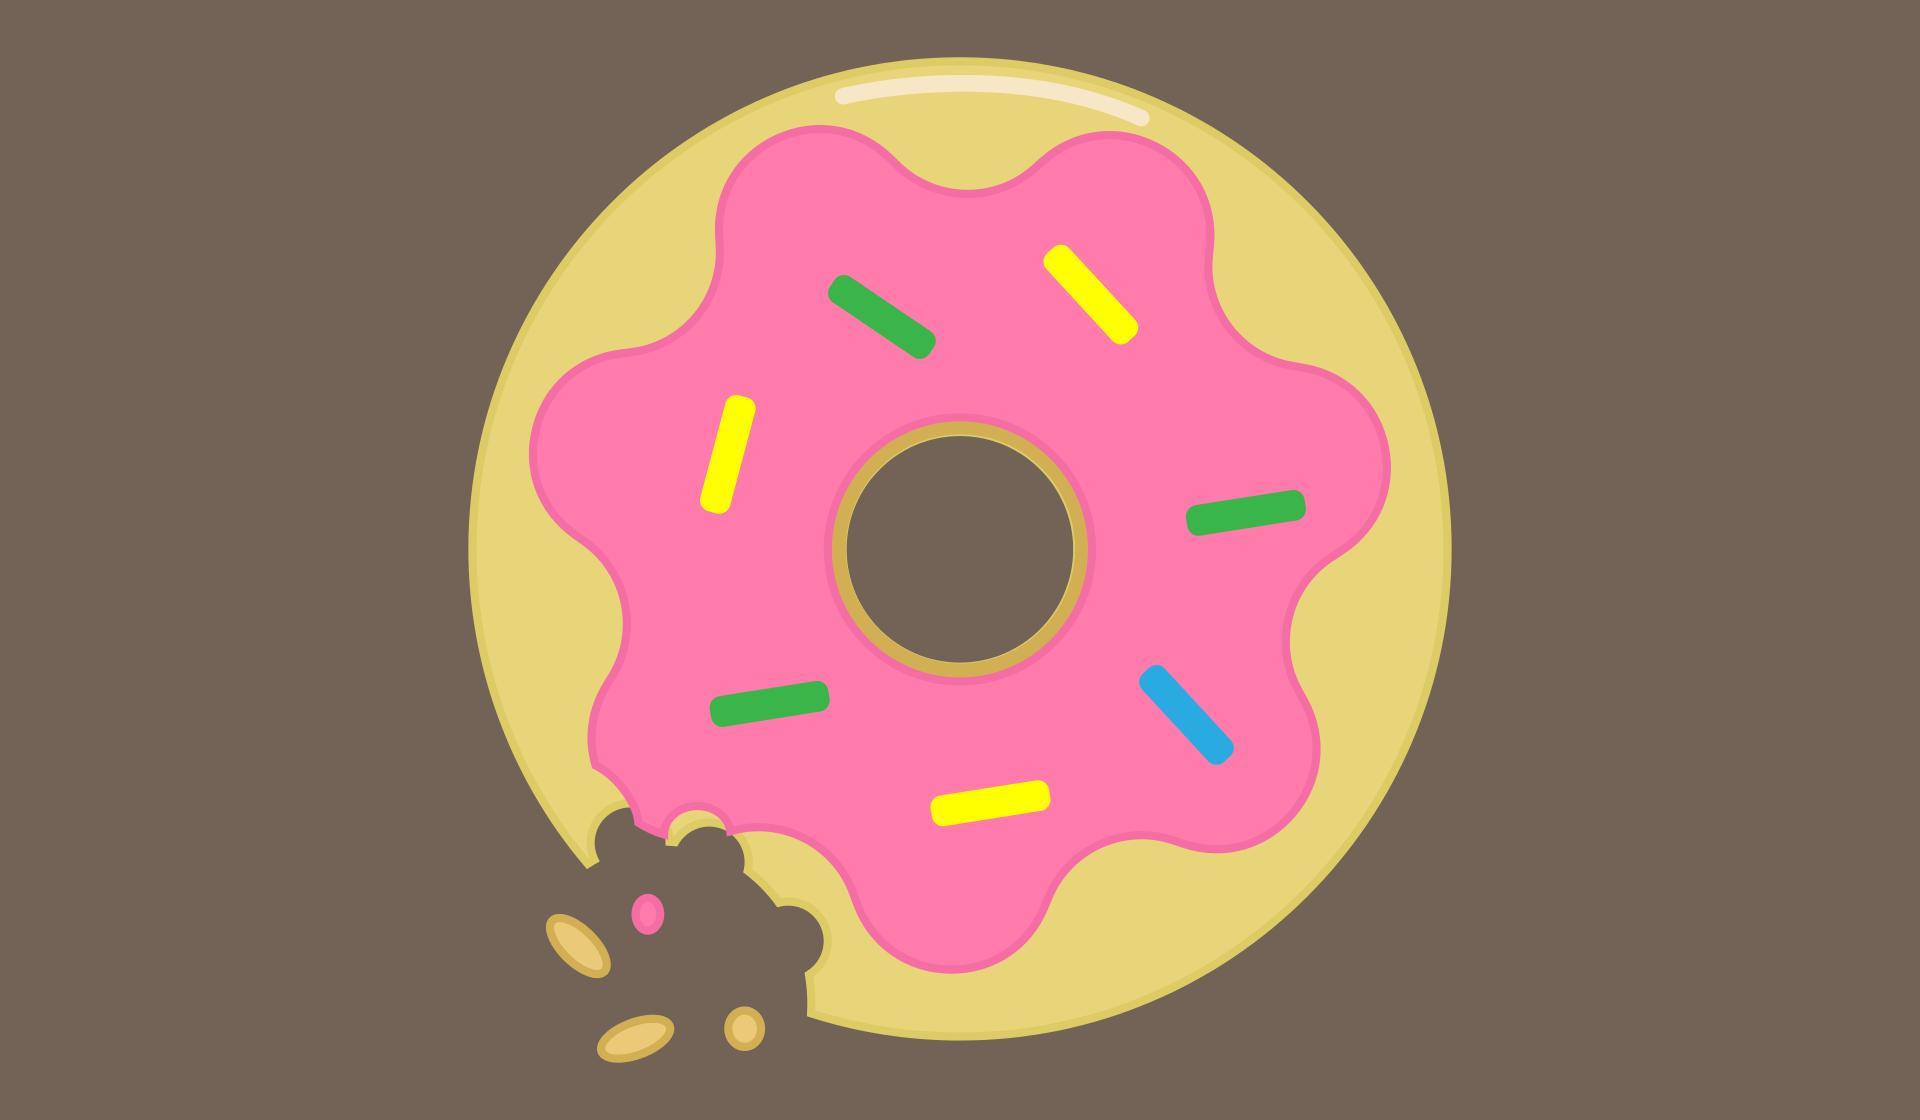 donut, ντόνατ, Γλυκό, επιδόρπιο, λούστρο - Wallpapers HD - Professor-falken.com